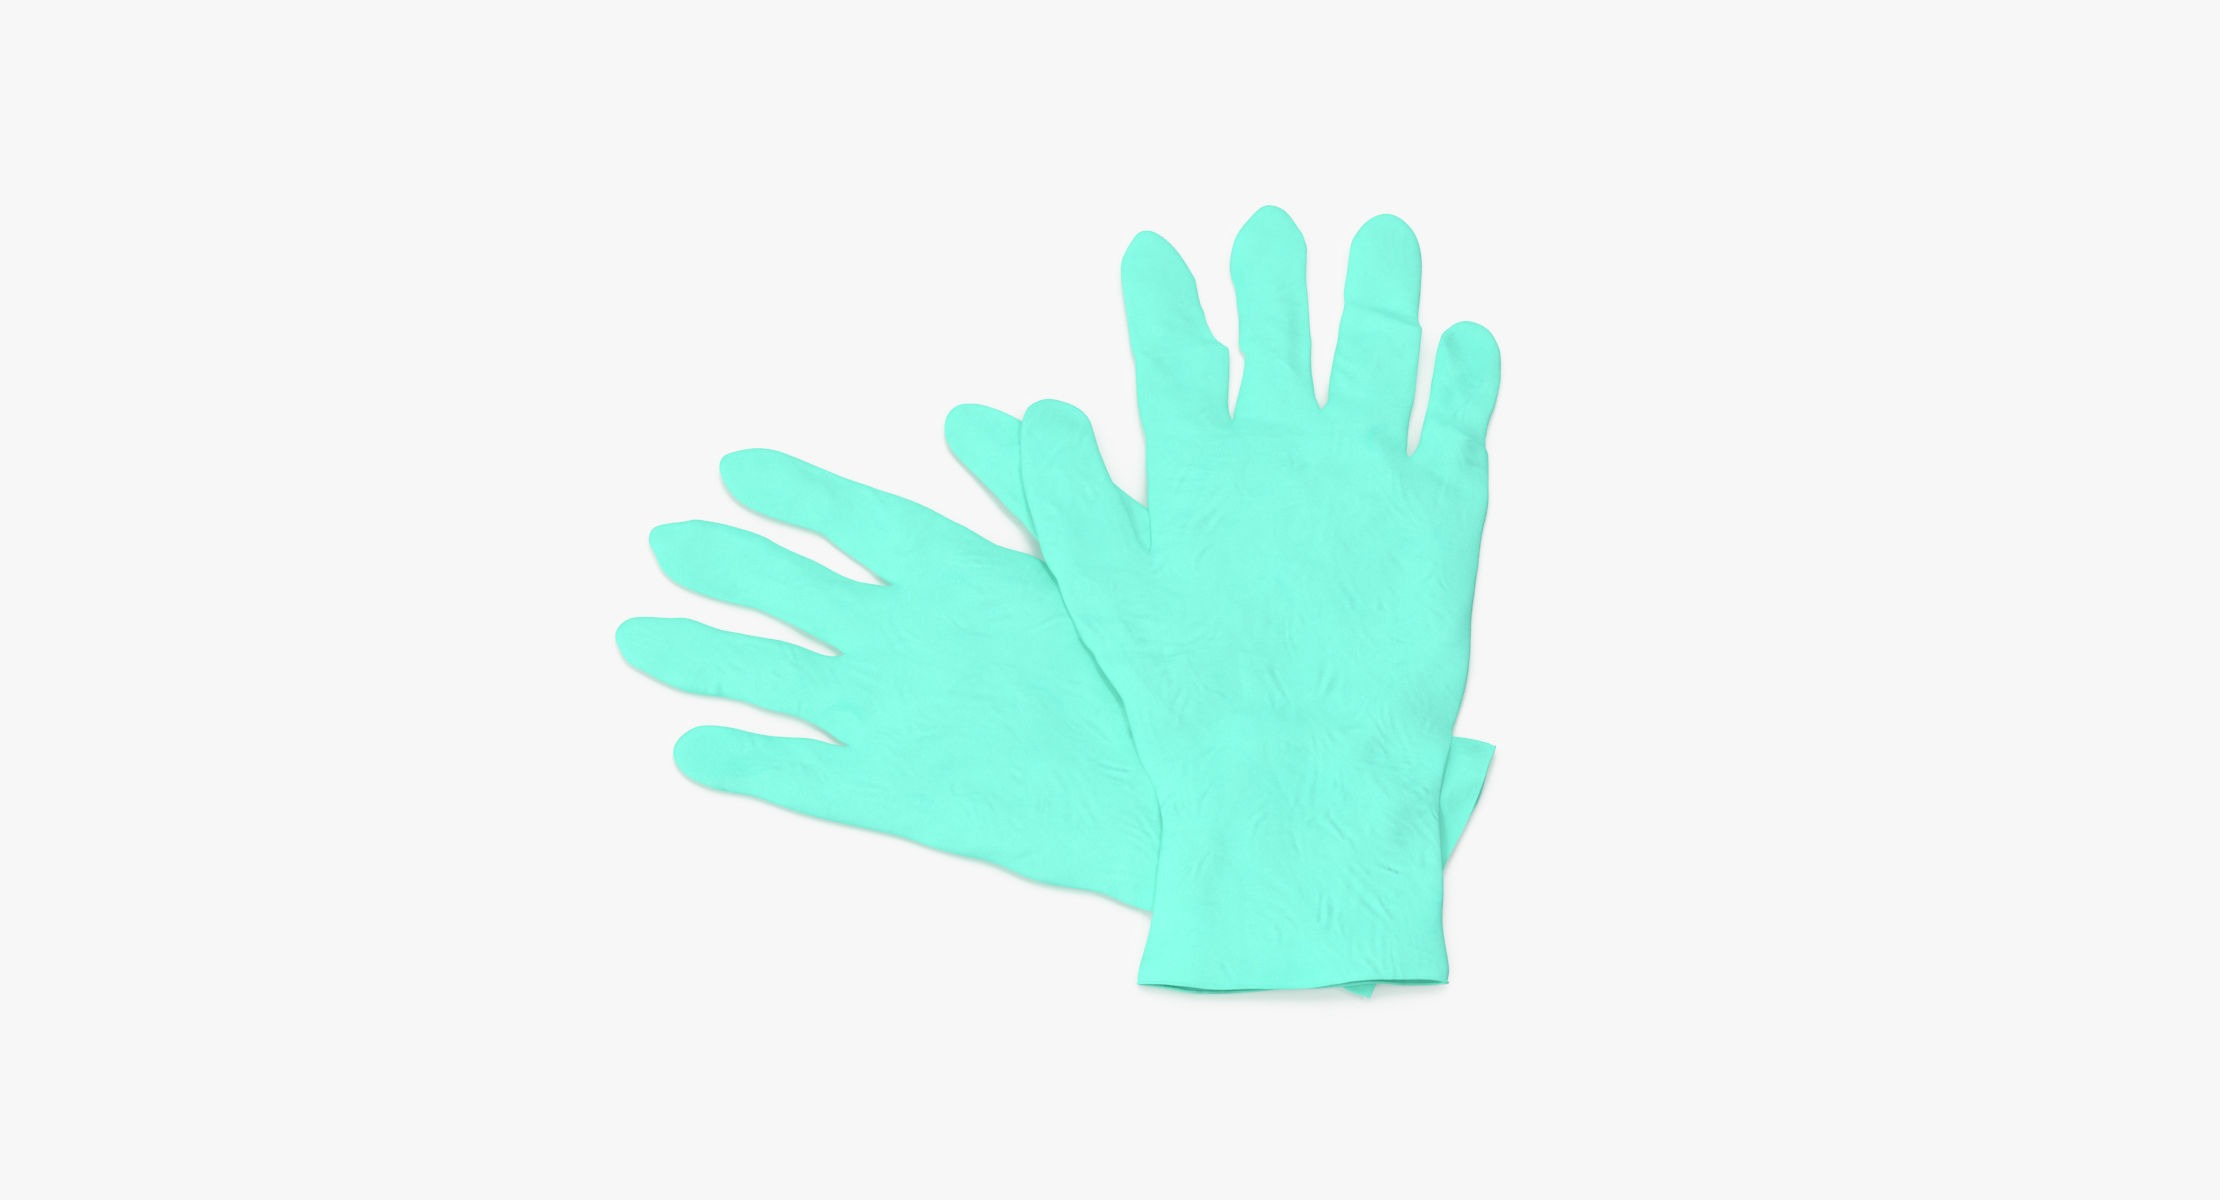 Surgical Gloves 02 - reel 1